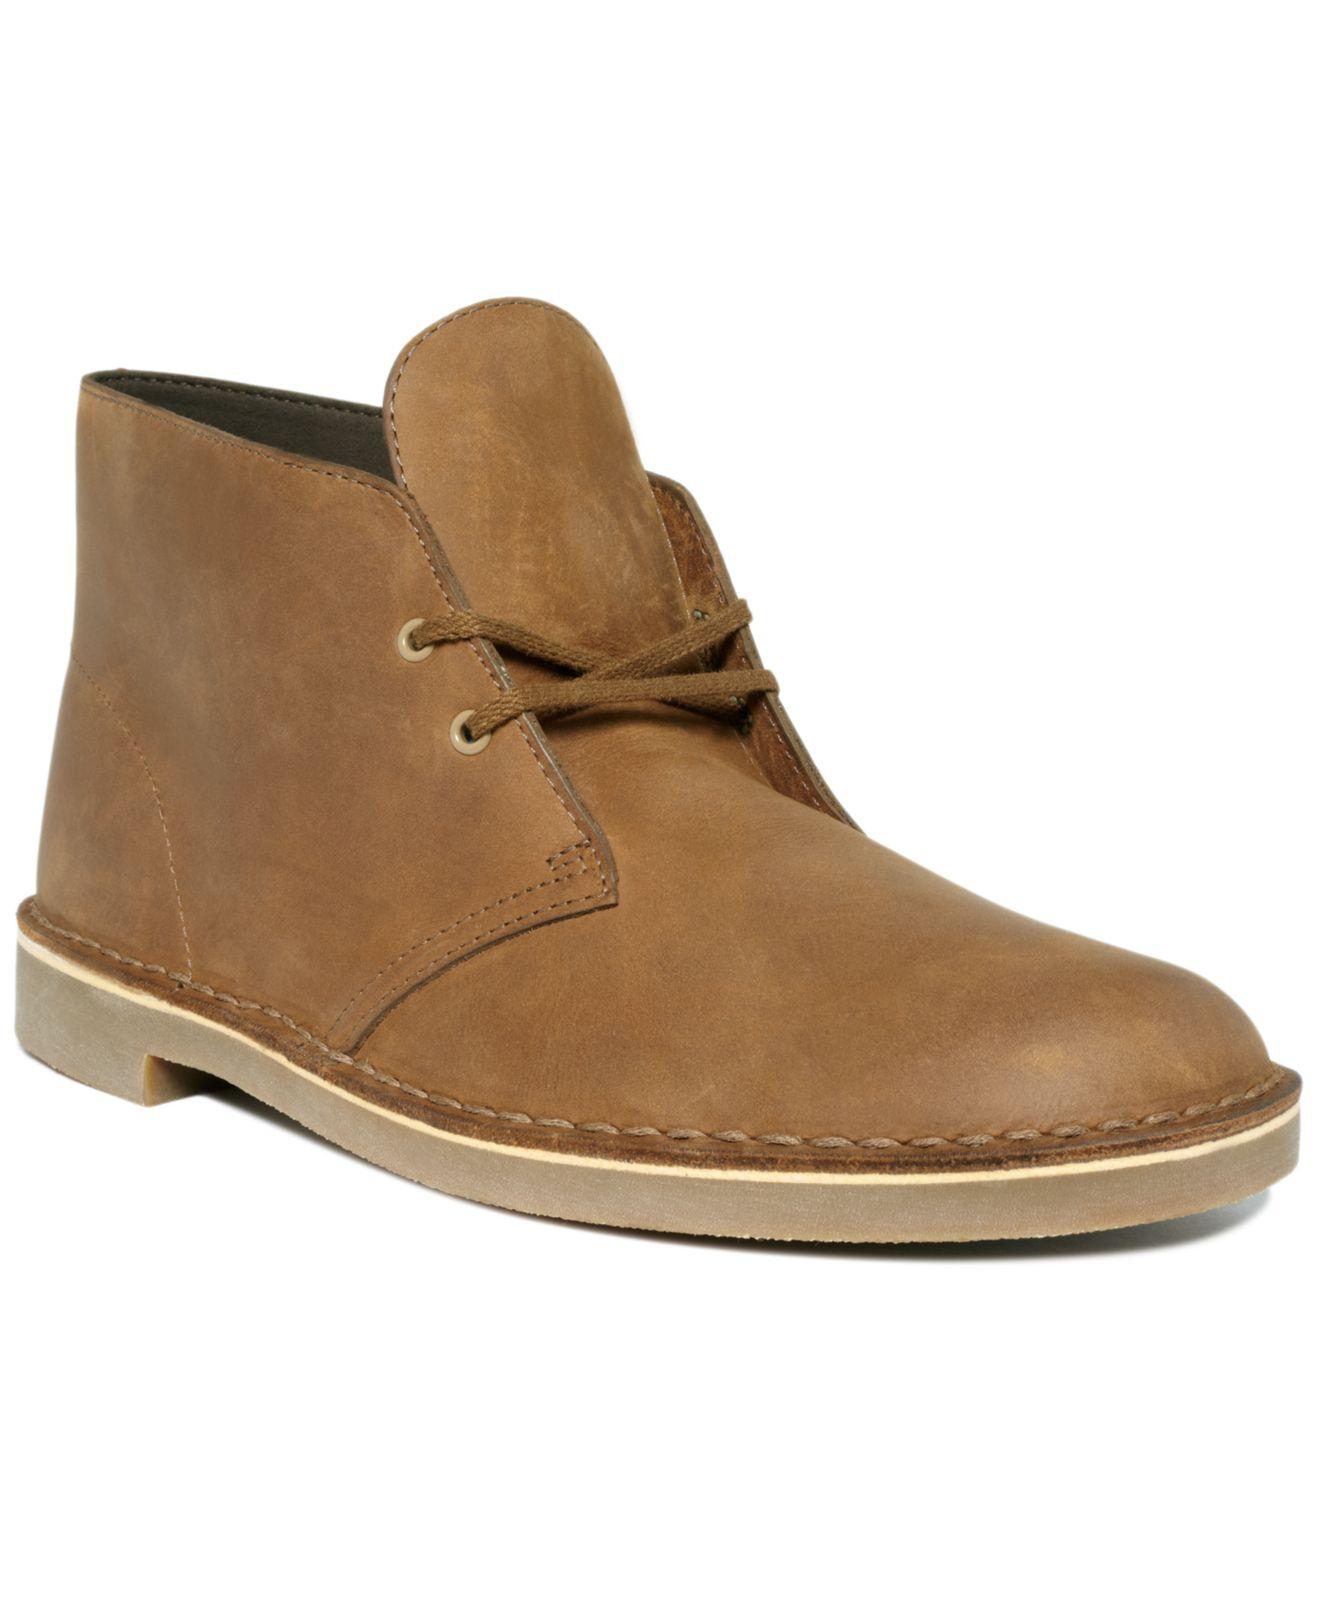 New Clarks Womens Desert Chukka Boot